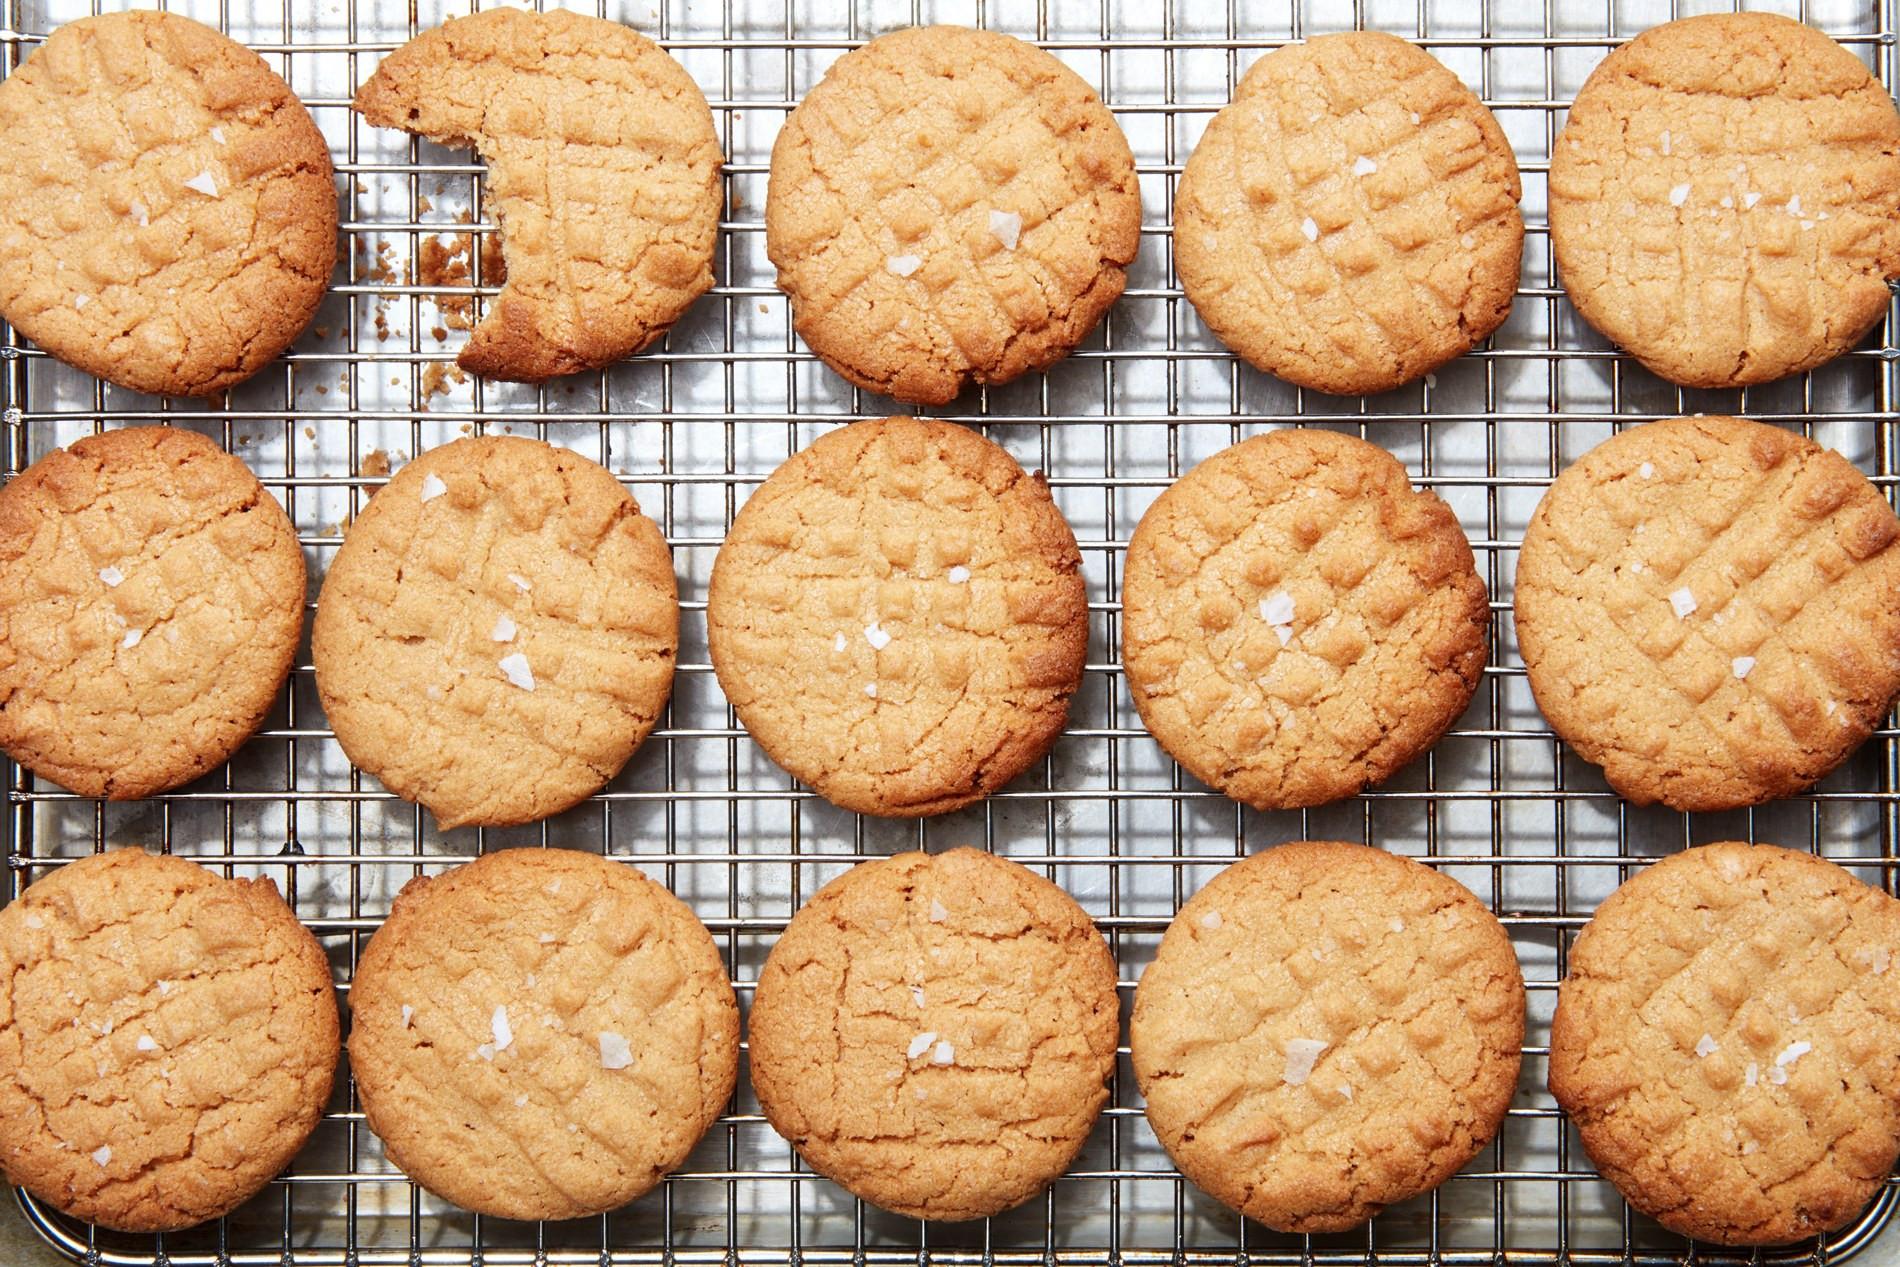 Peanut Butter Cookies Recipes  3 Ingre nt Peanut Butter Cookies recipe